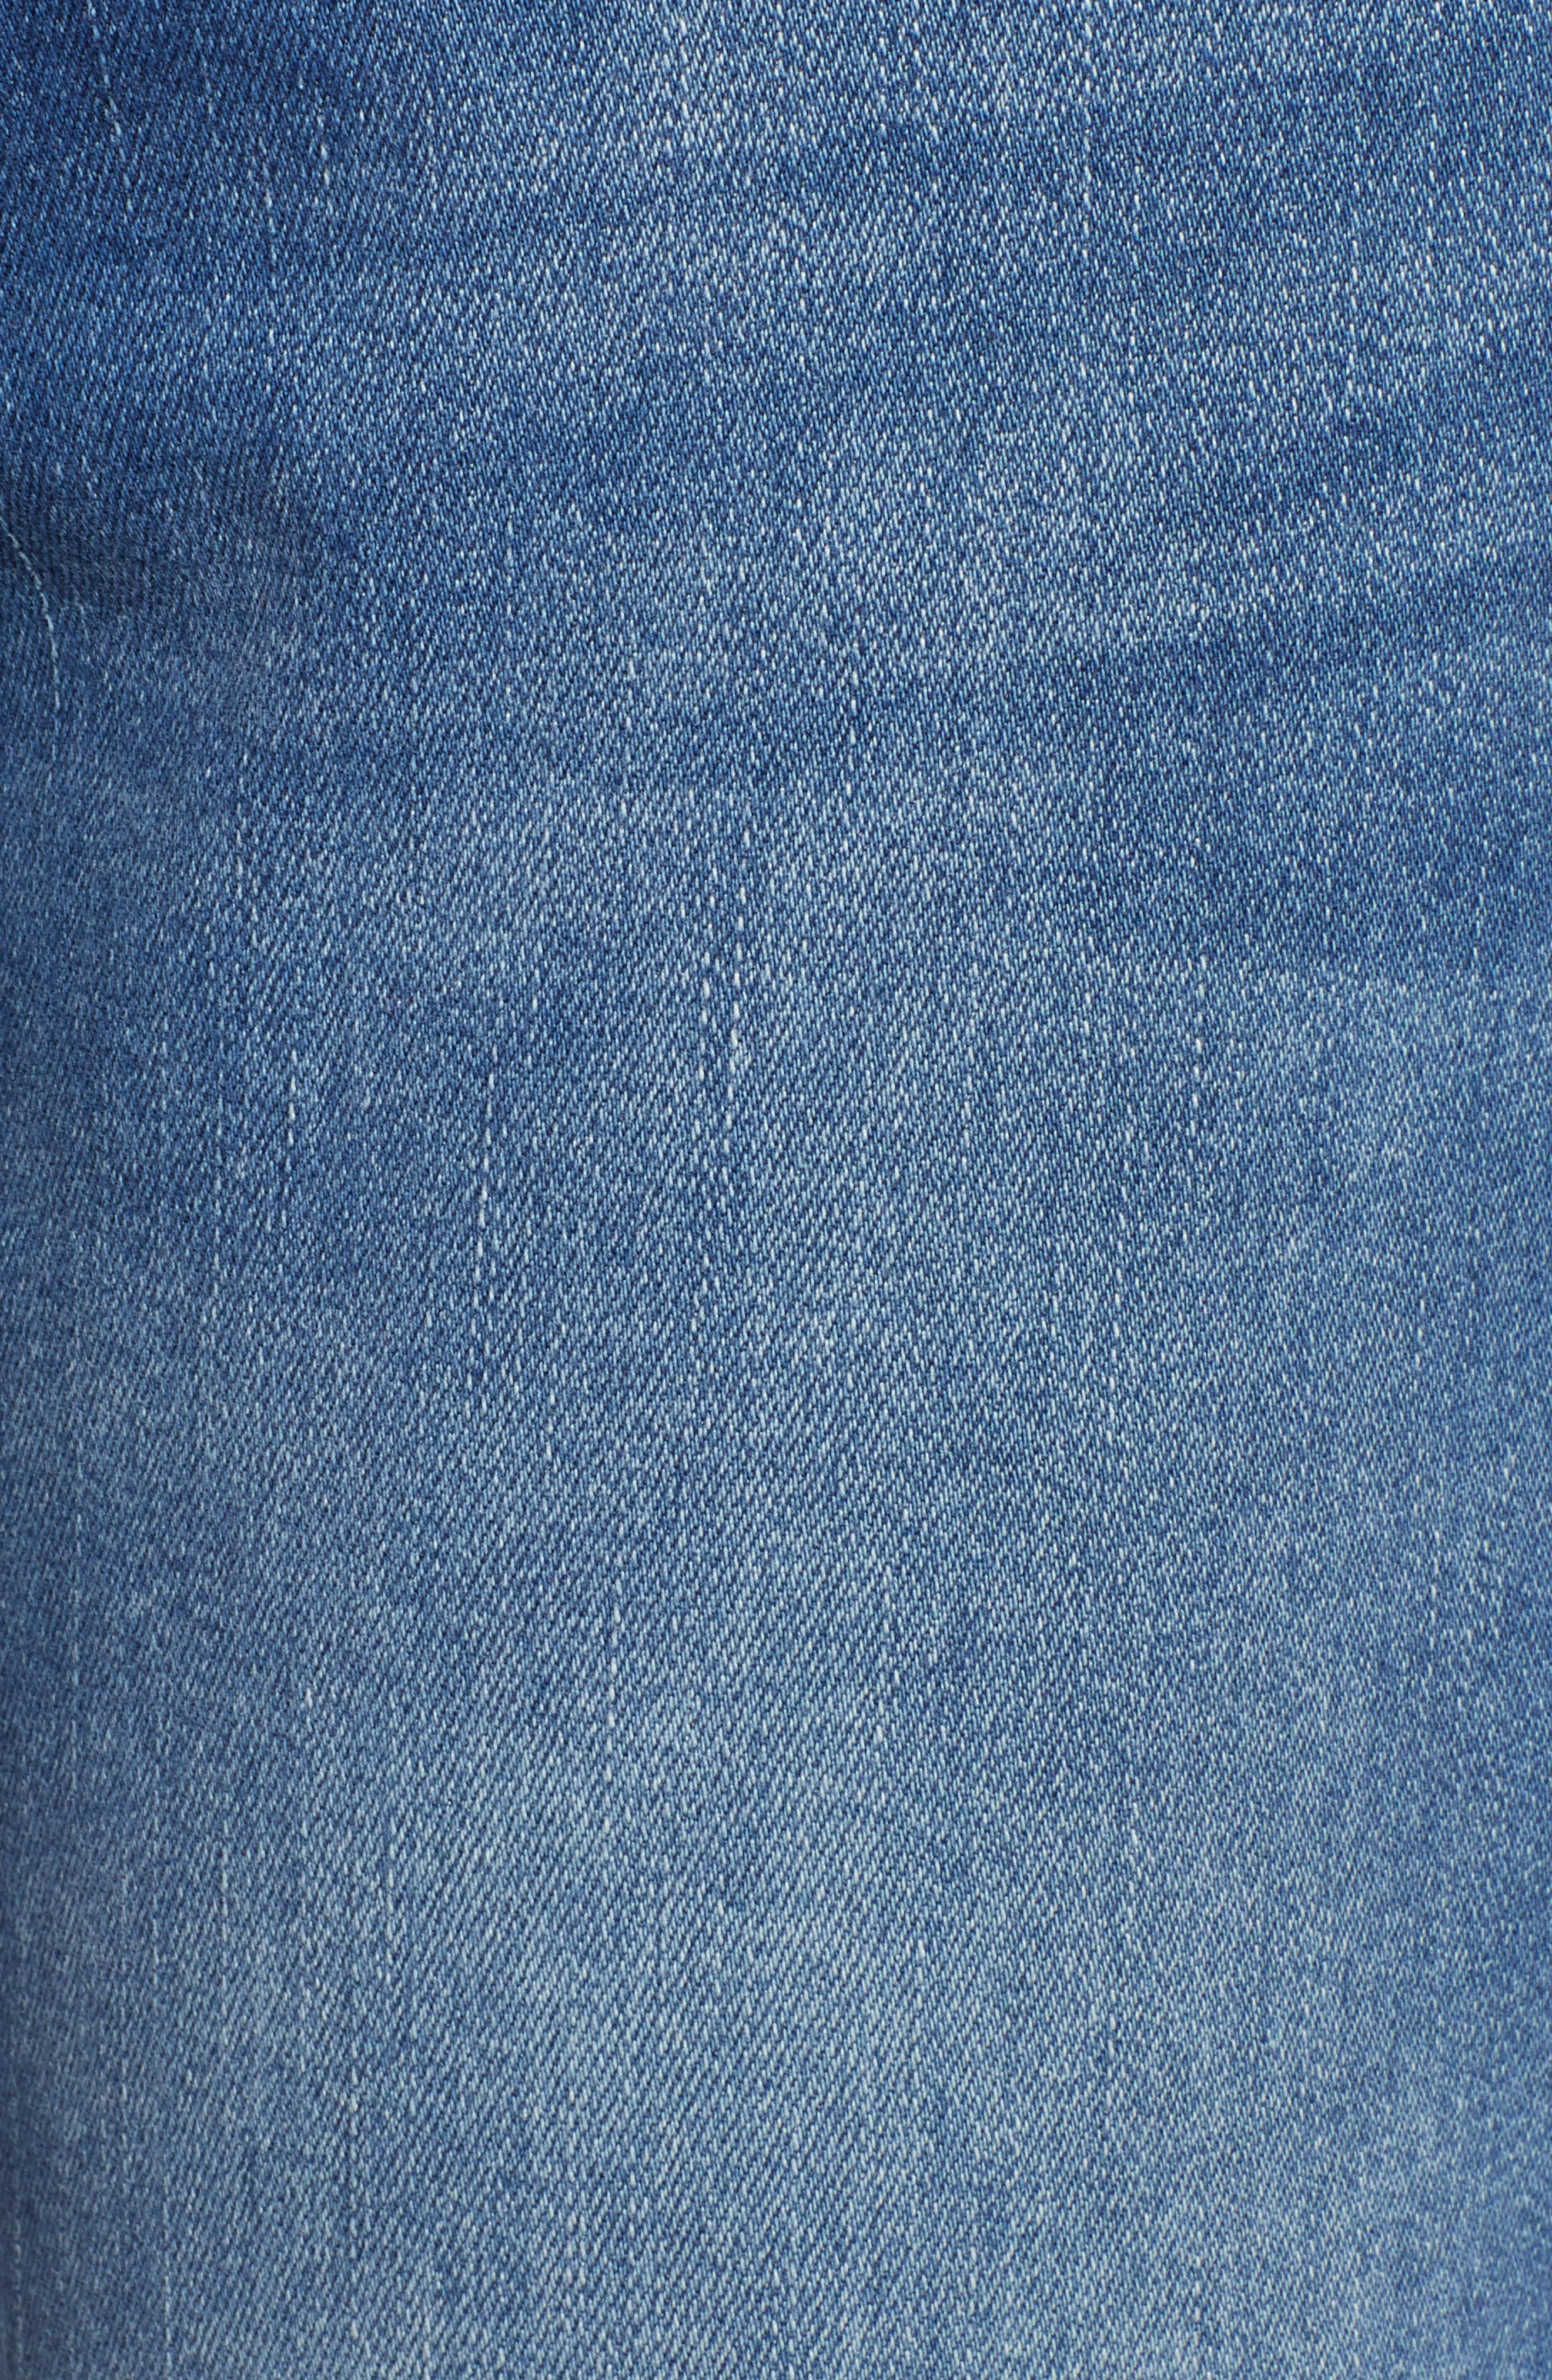 TOMMY BAHAMA, Tema Slim Boyfriend Jeans, Alternate thumbnail 6, color, DARK INDIGO WASH